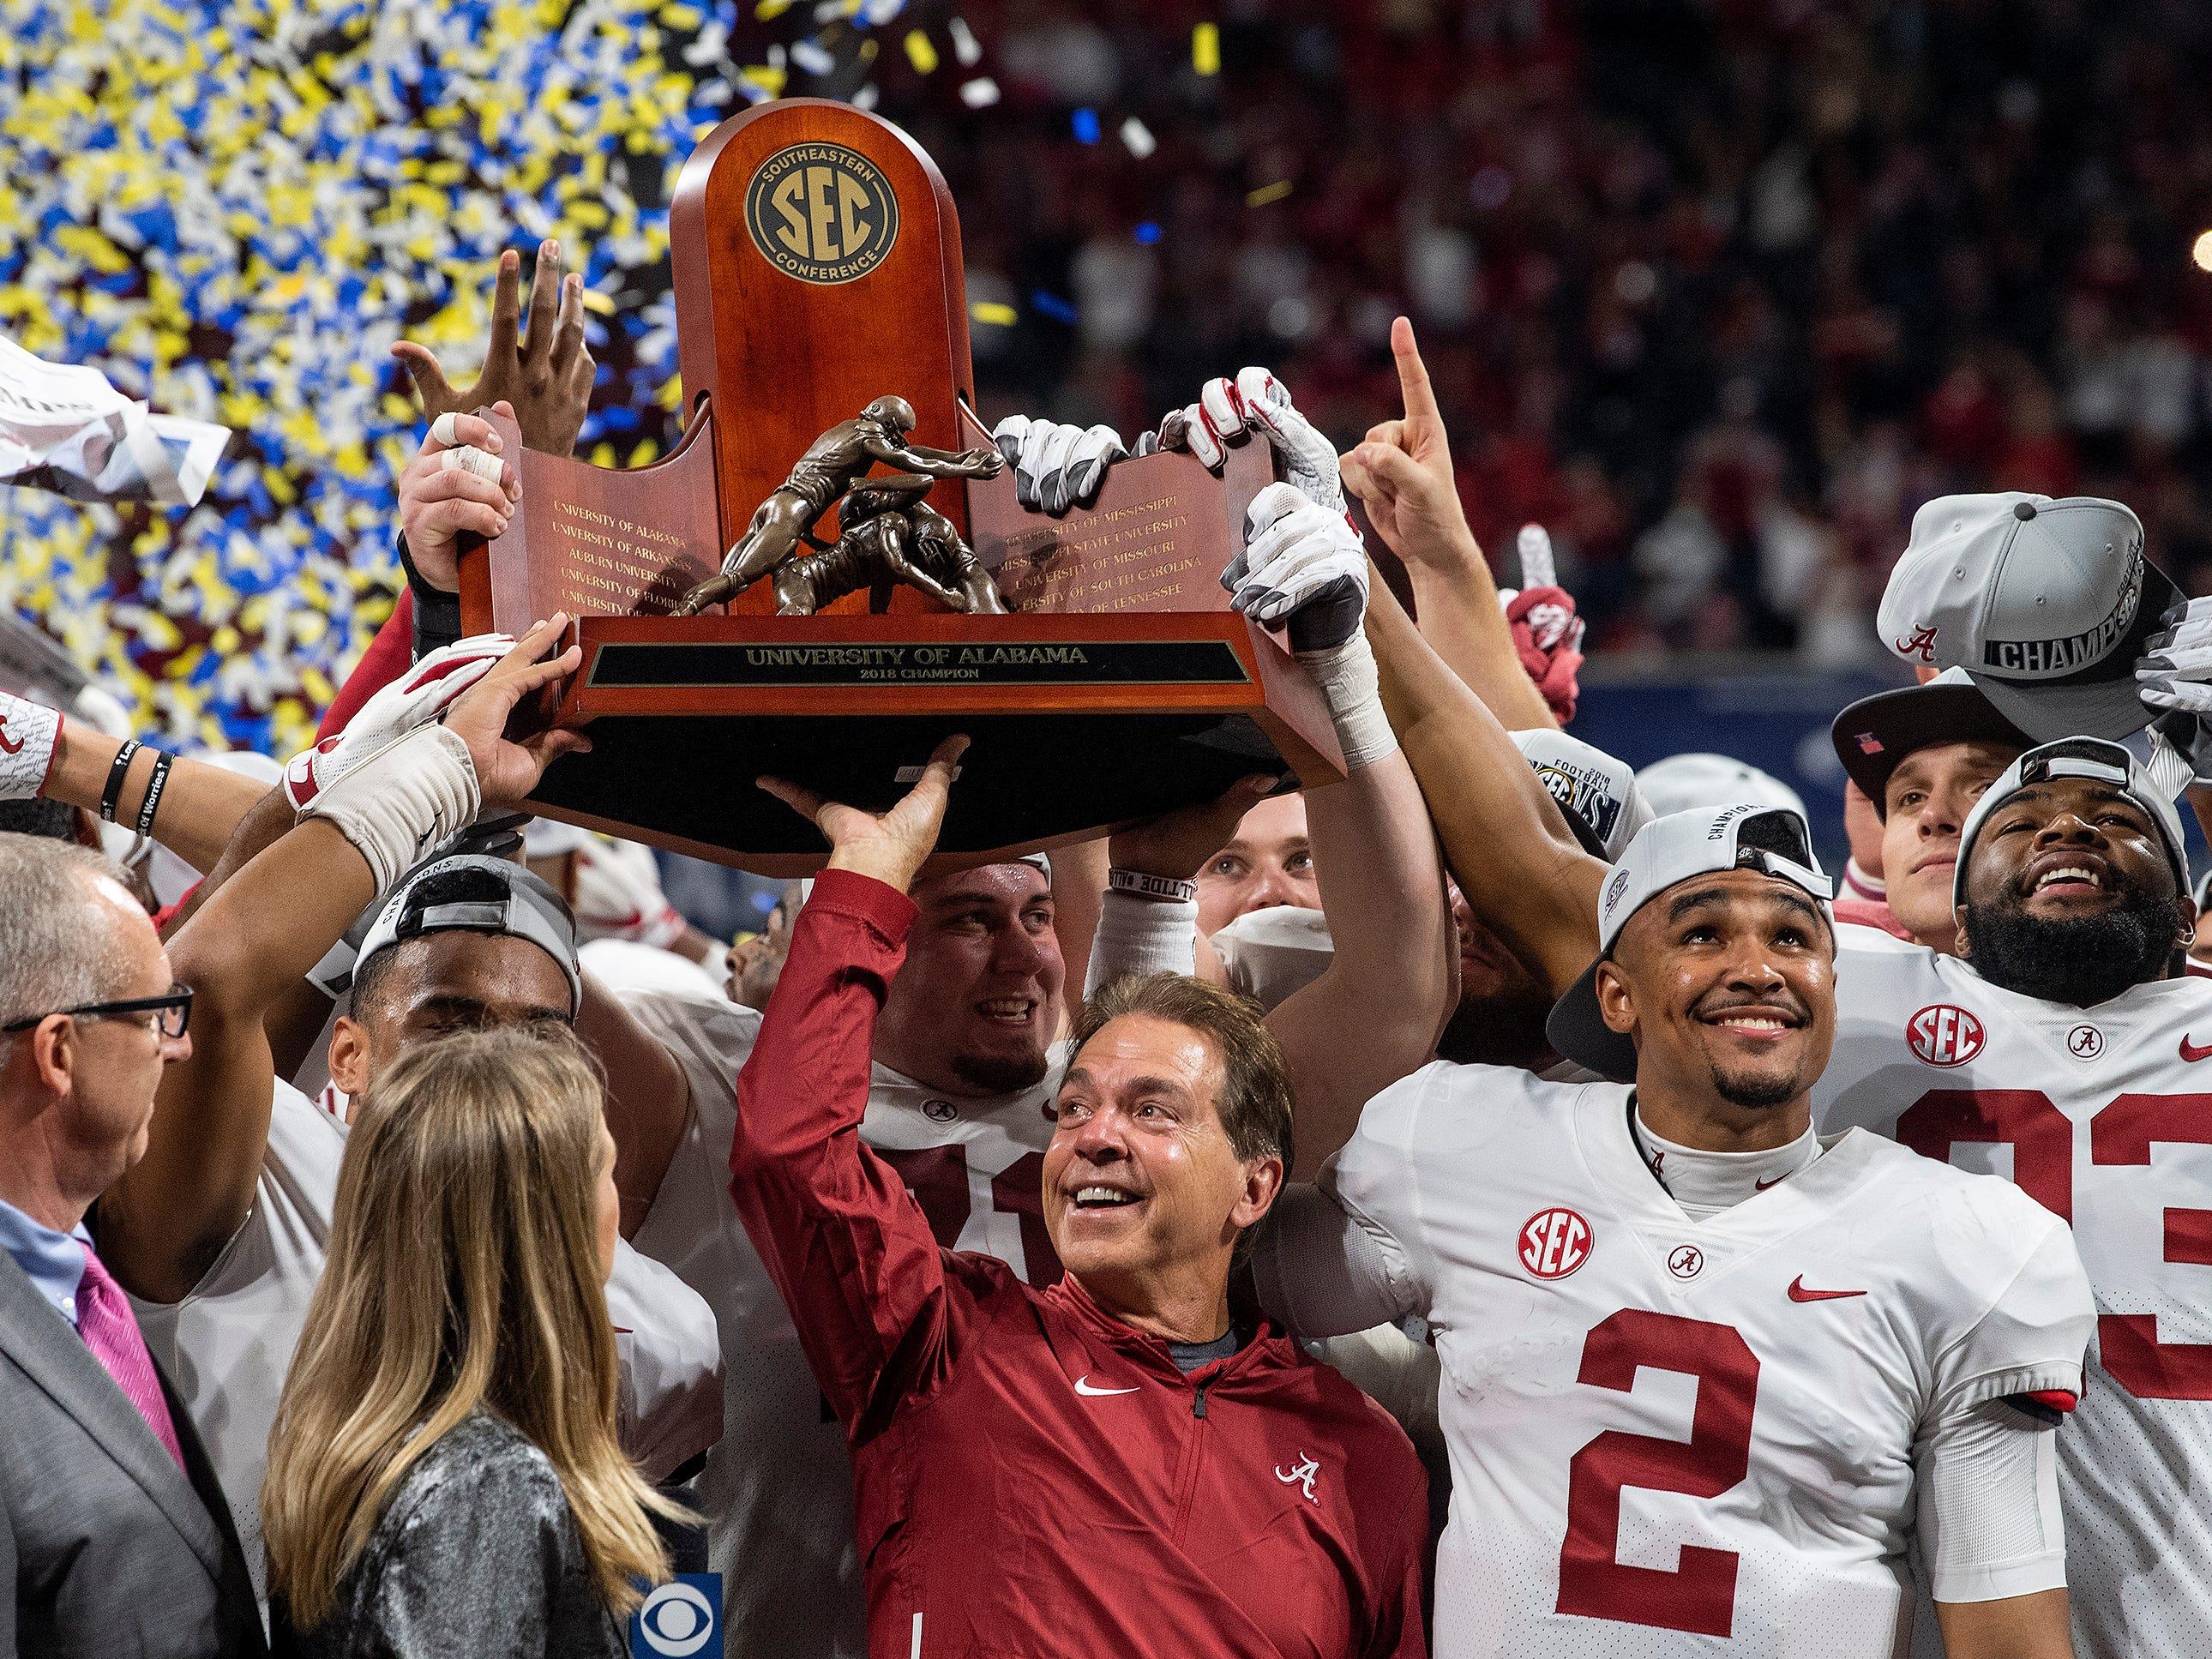 Alabama head coach Nick Saban and Alabama quarterback Jalen Hurts (2) lift the SEC Trophy after defeating Georgia  in the SEC Championship Game at Mercedes-Benz Stadium in Atlanta on Saturday, Dec. 1, 2018.